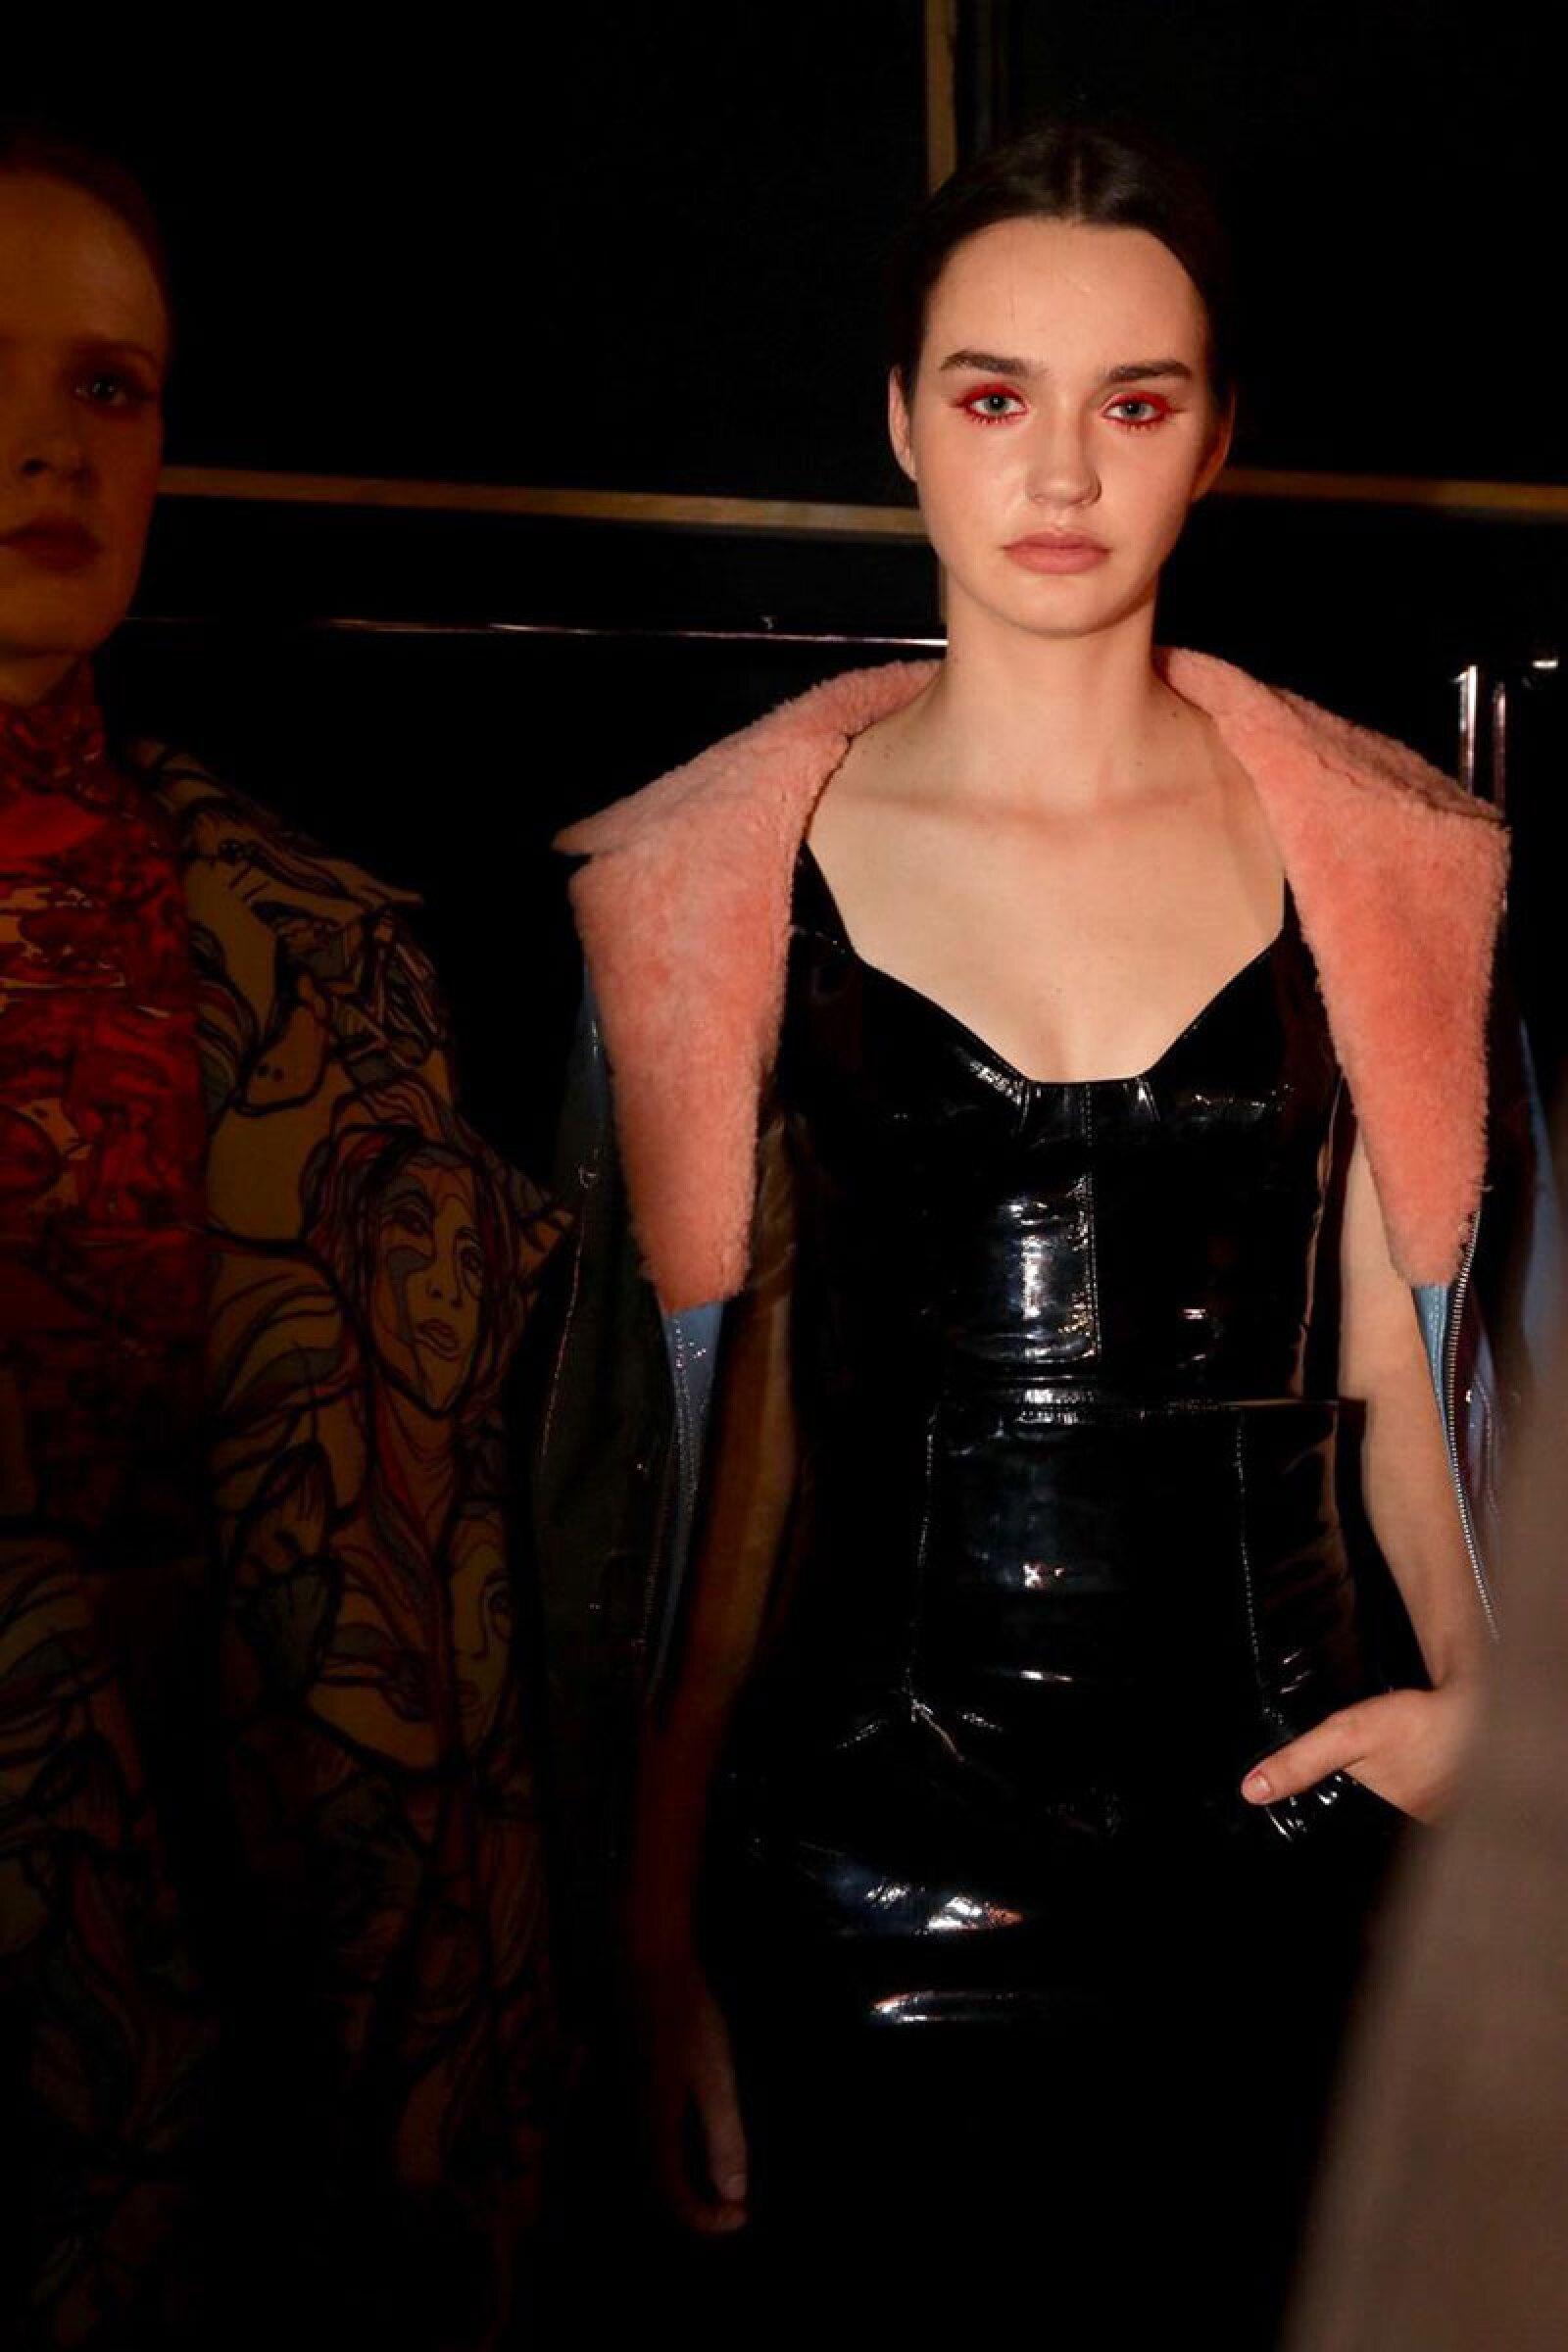 Desfile-Alexia-Ulibarri-MBFWM-Backstage-Model-4